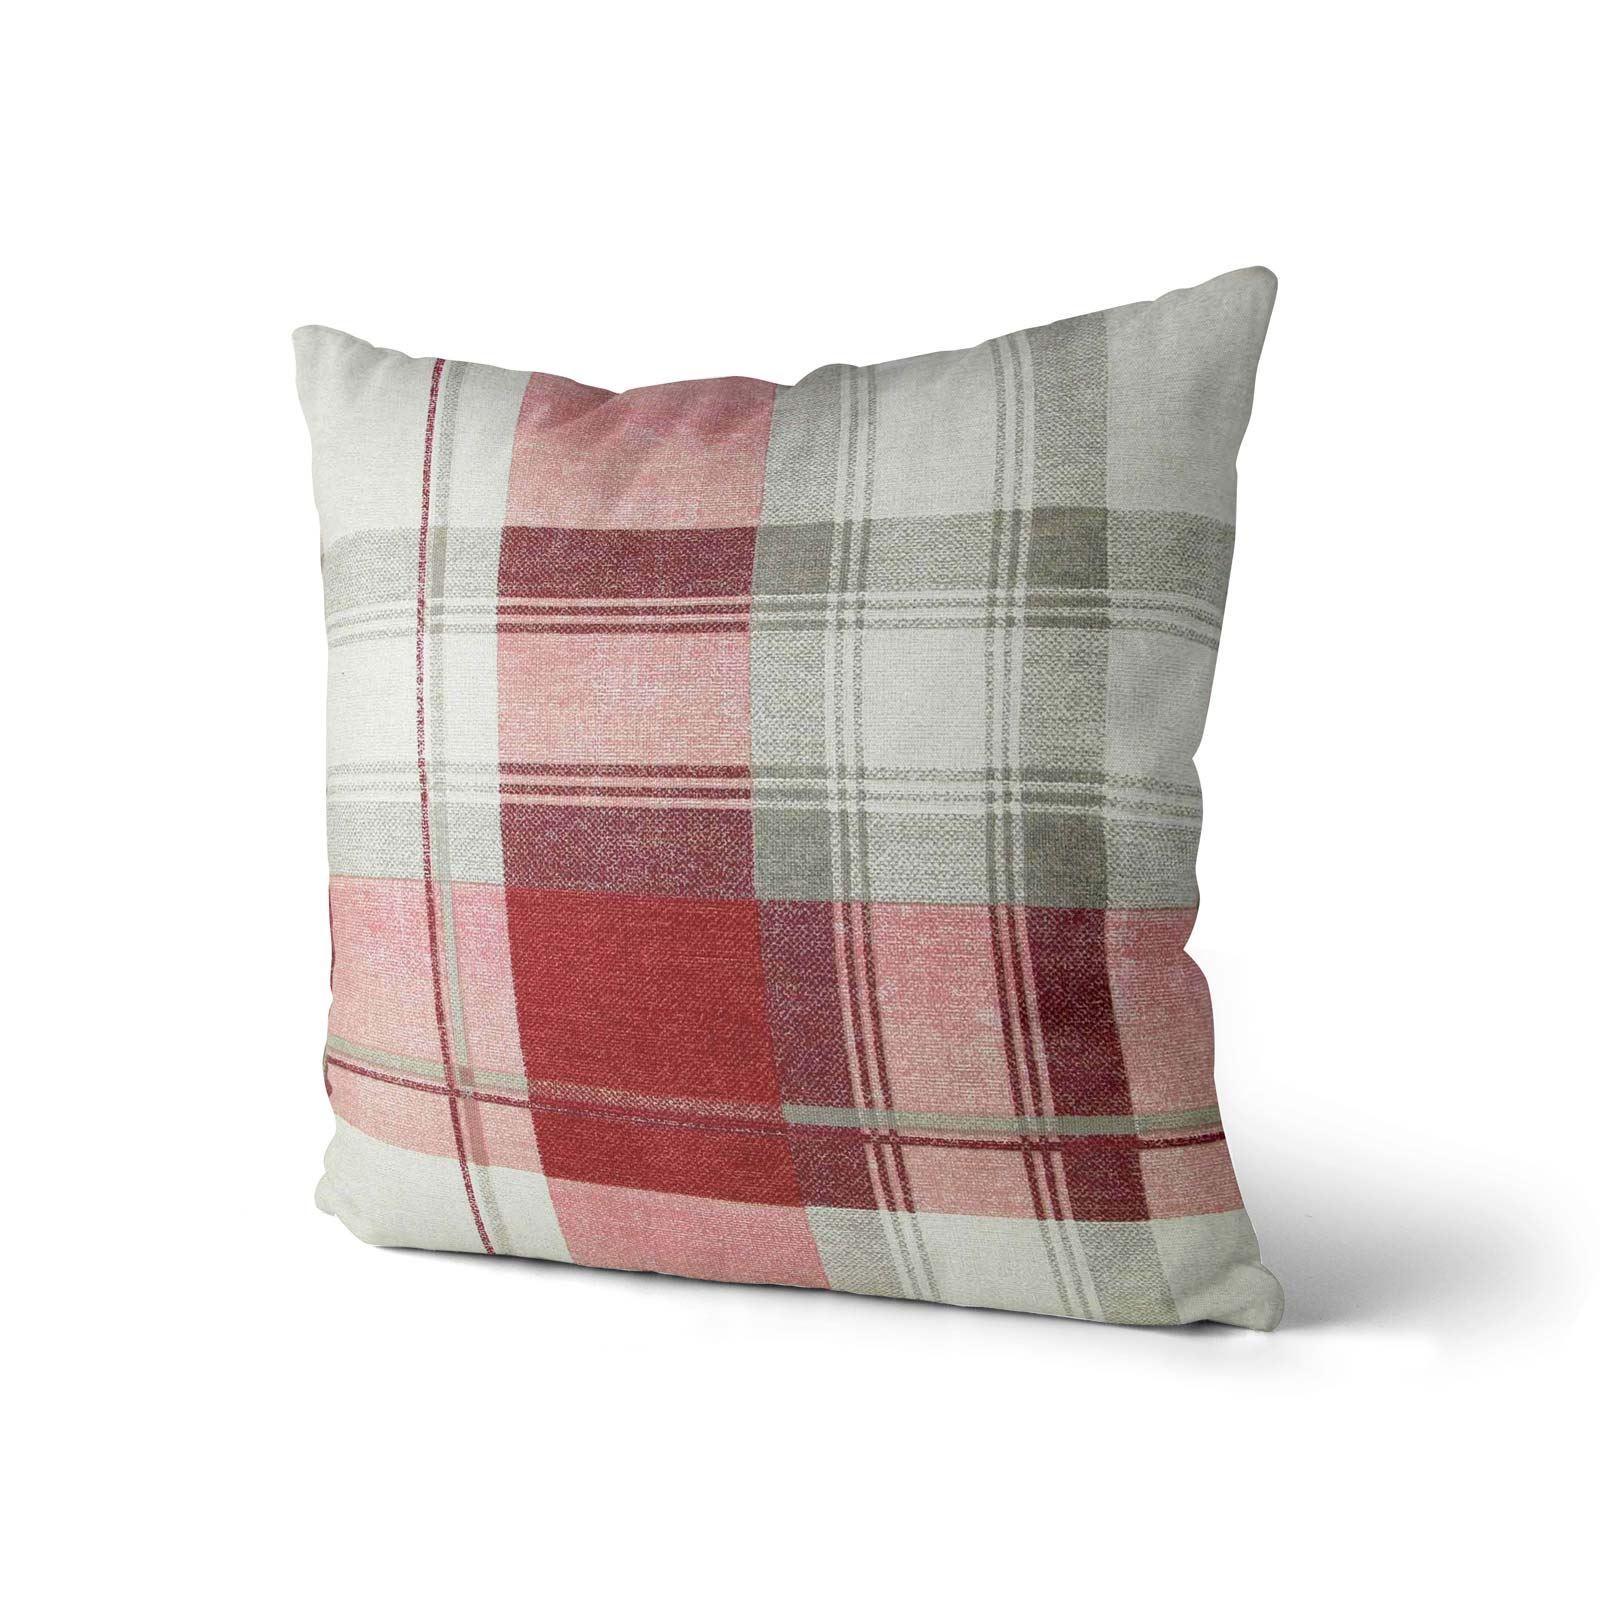 Vino-Tinto-Cushion-Covers-Coleccion-17-034-18-034-43cm-45cm-Cubierta miniatura 42